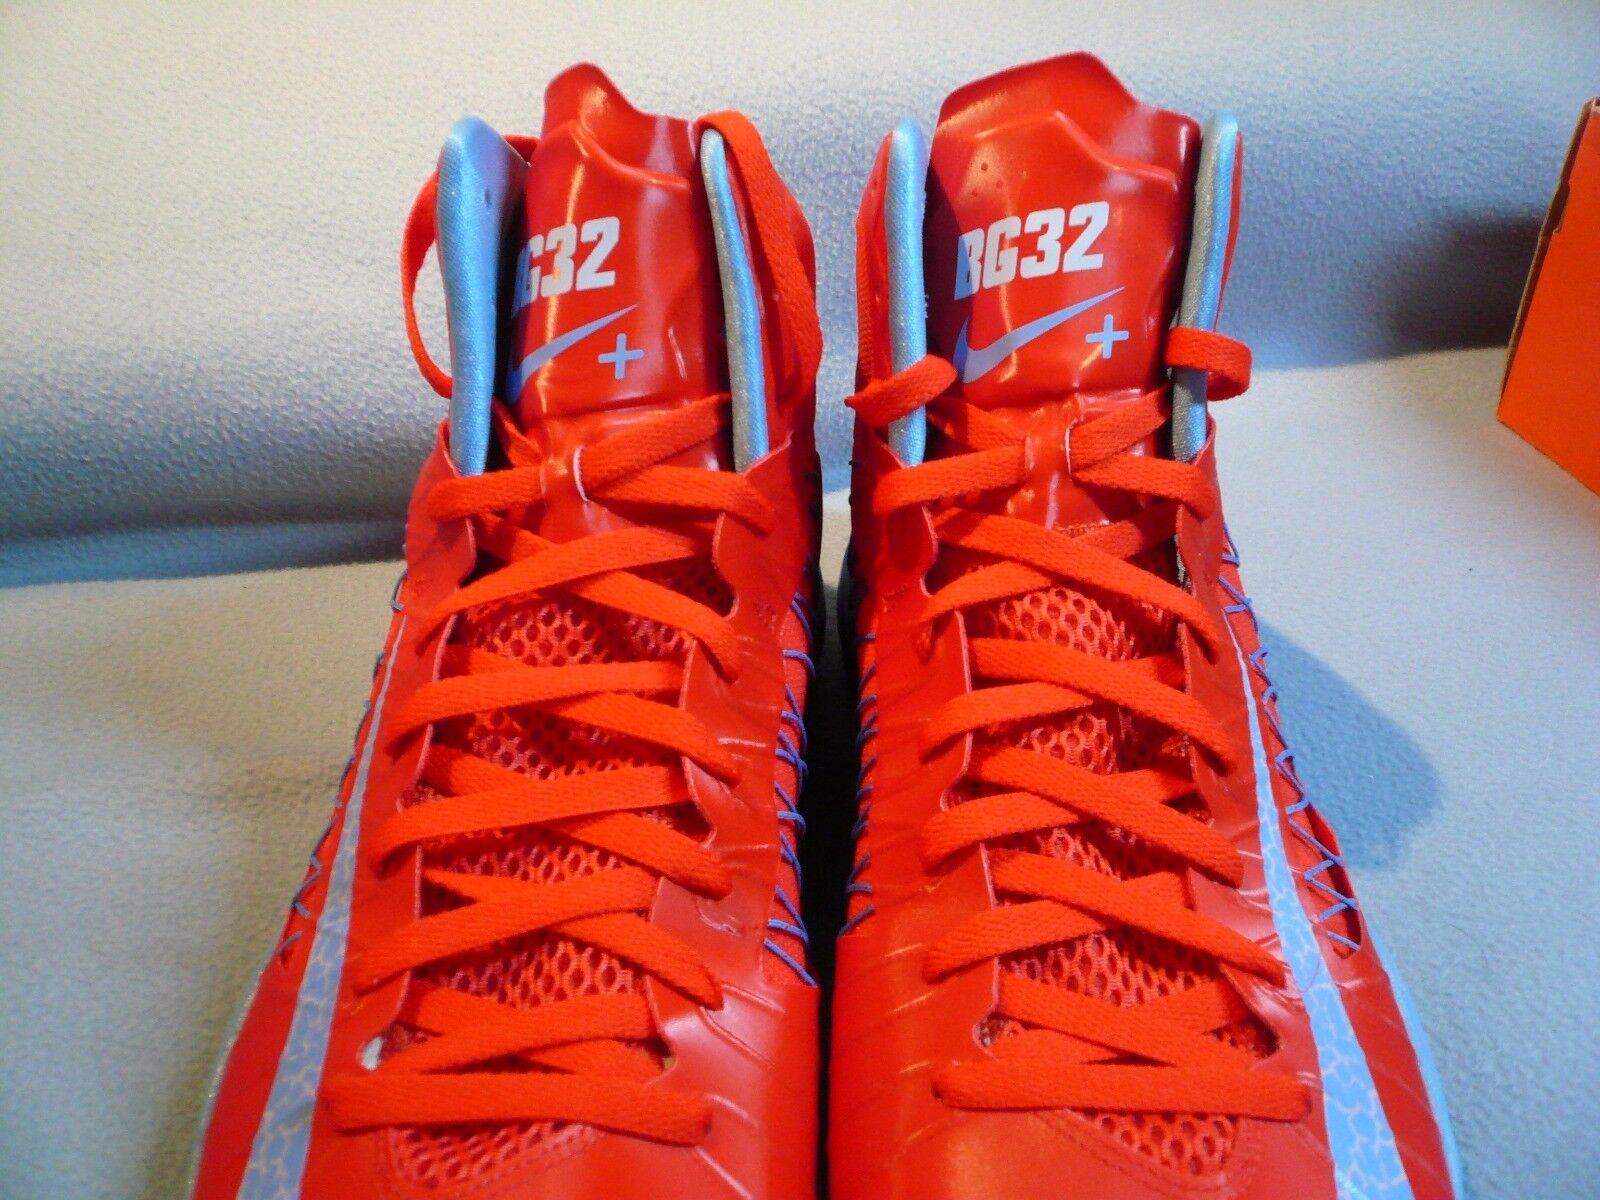 quality design b695c 57497 ... Nike Hyperdunk+ Blake Griffin BG 32 size size size 18 BRAND NEW Shoes  Basketball Pistons 500d54 ...